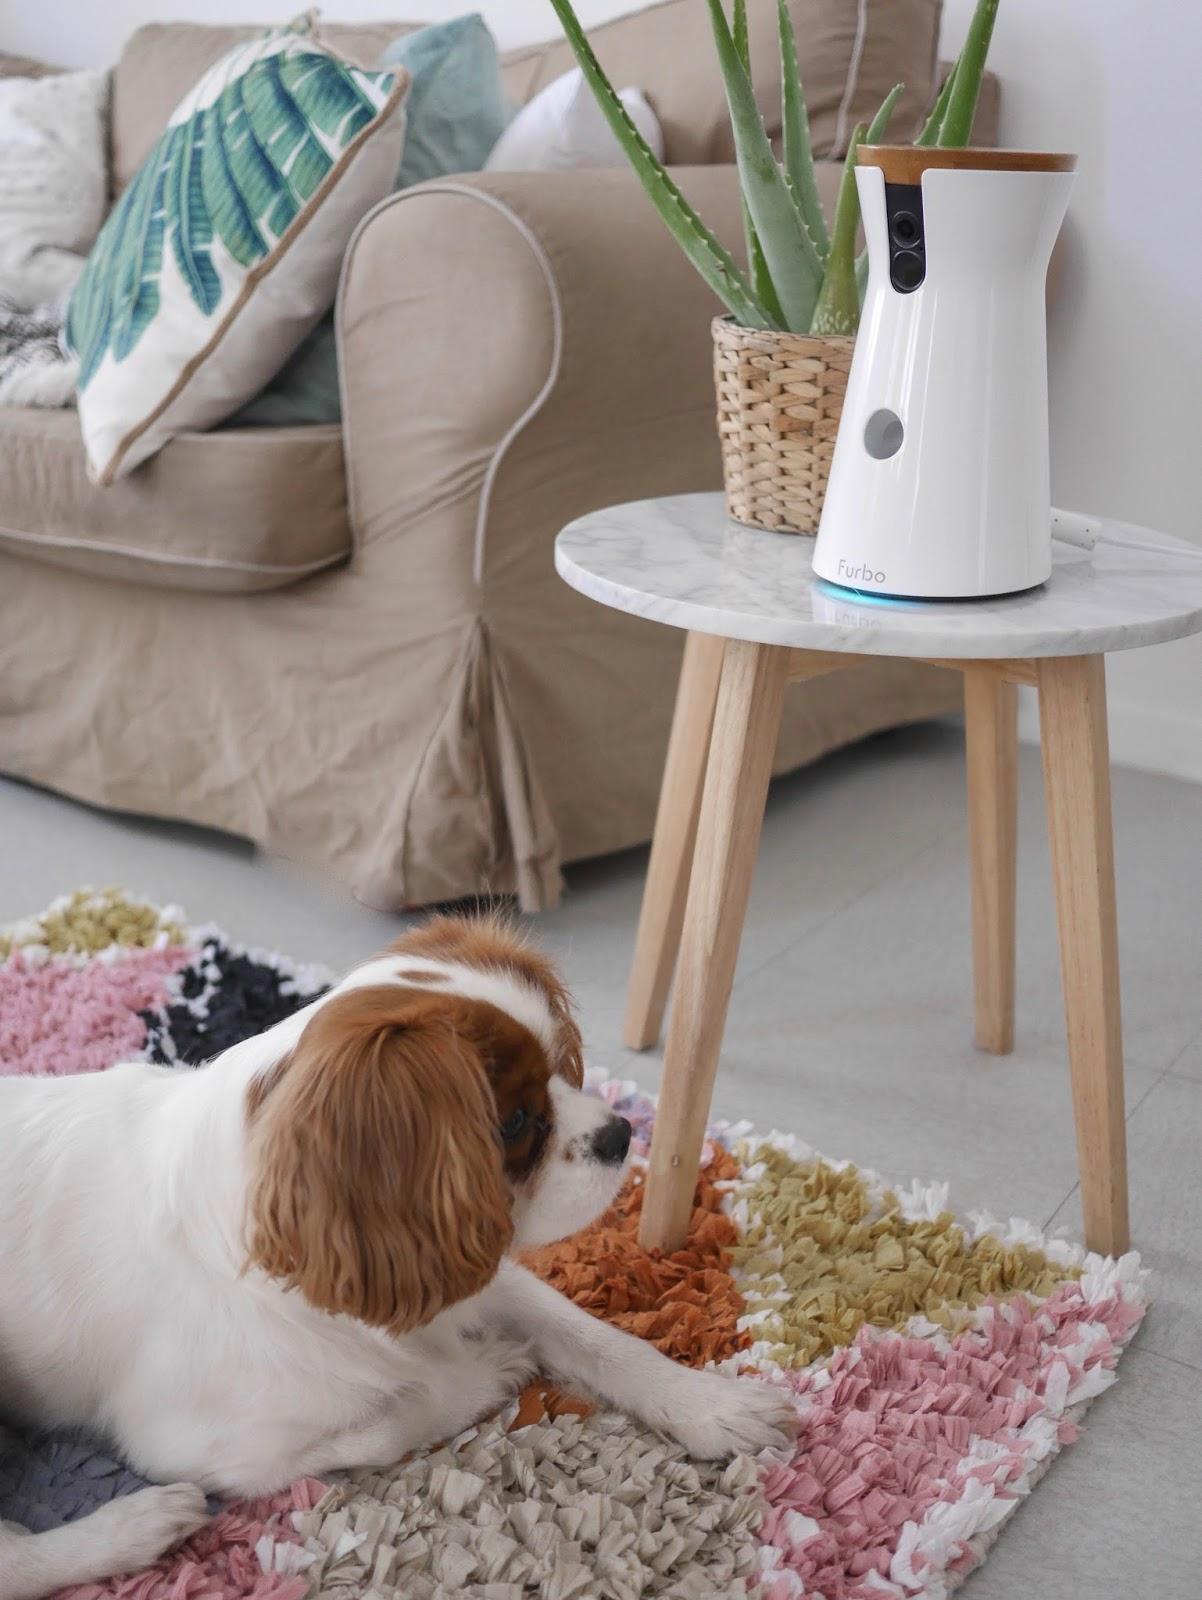 camera surveillance chien parisgrenoble